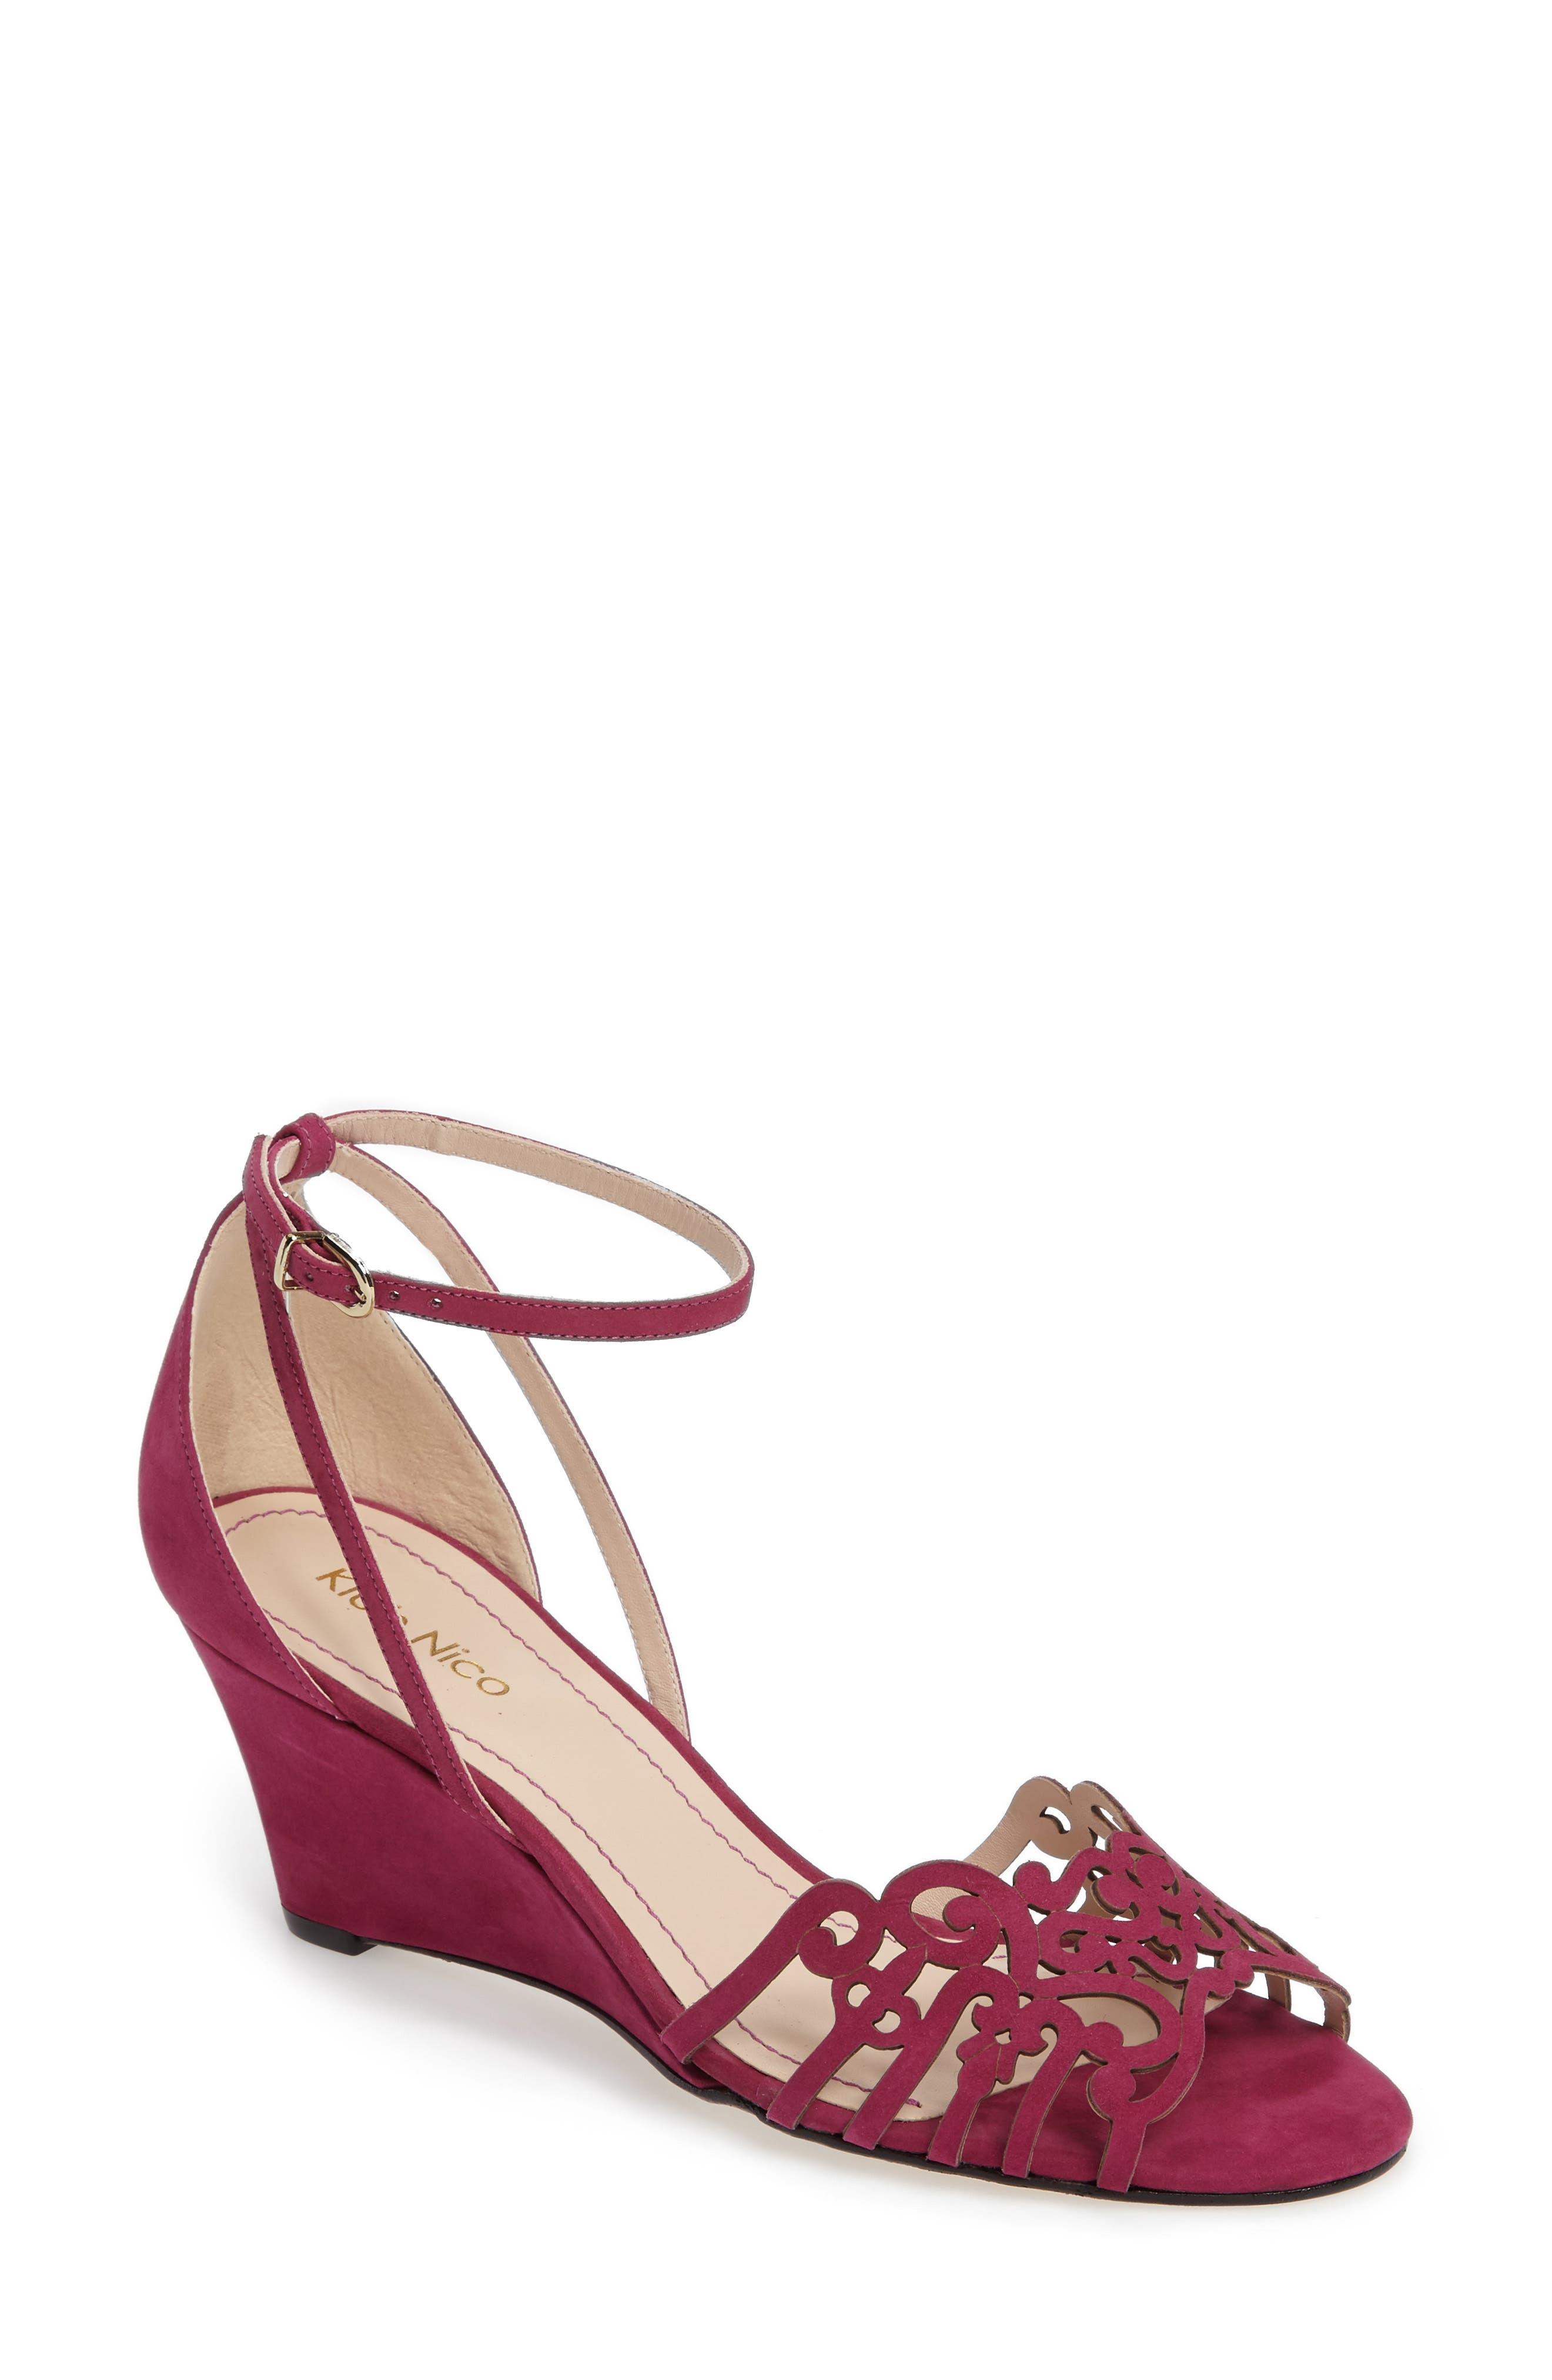 Alternate Image 1 Selected - Klub Nico 'Kingston' Ankle Strap Wedge Sandal (Women)